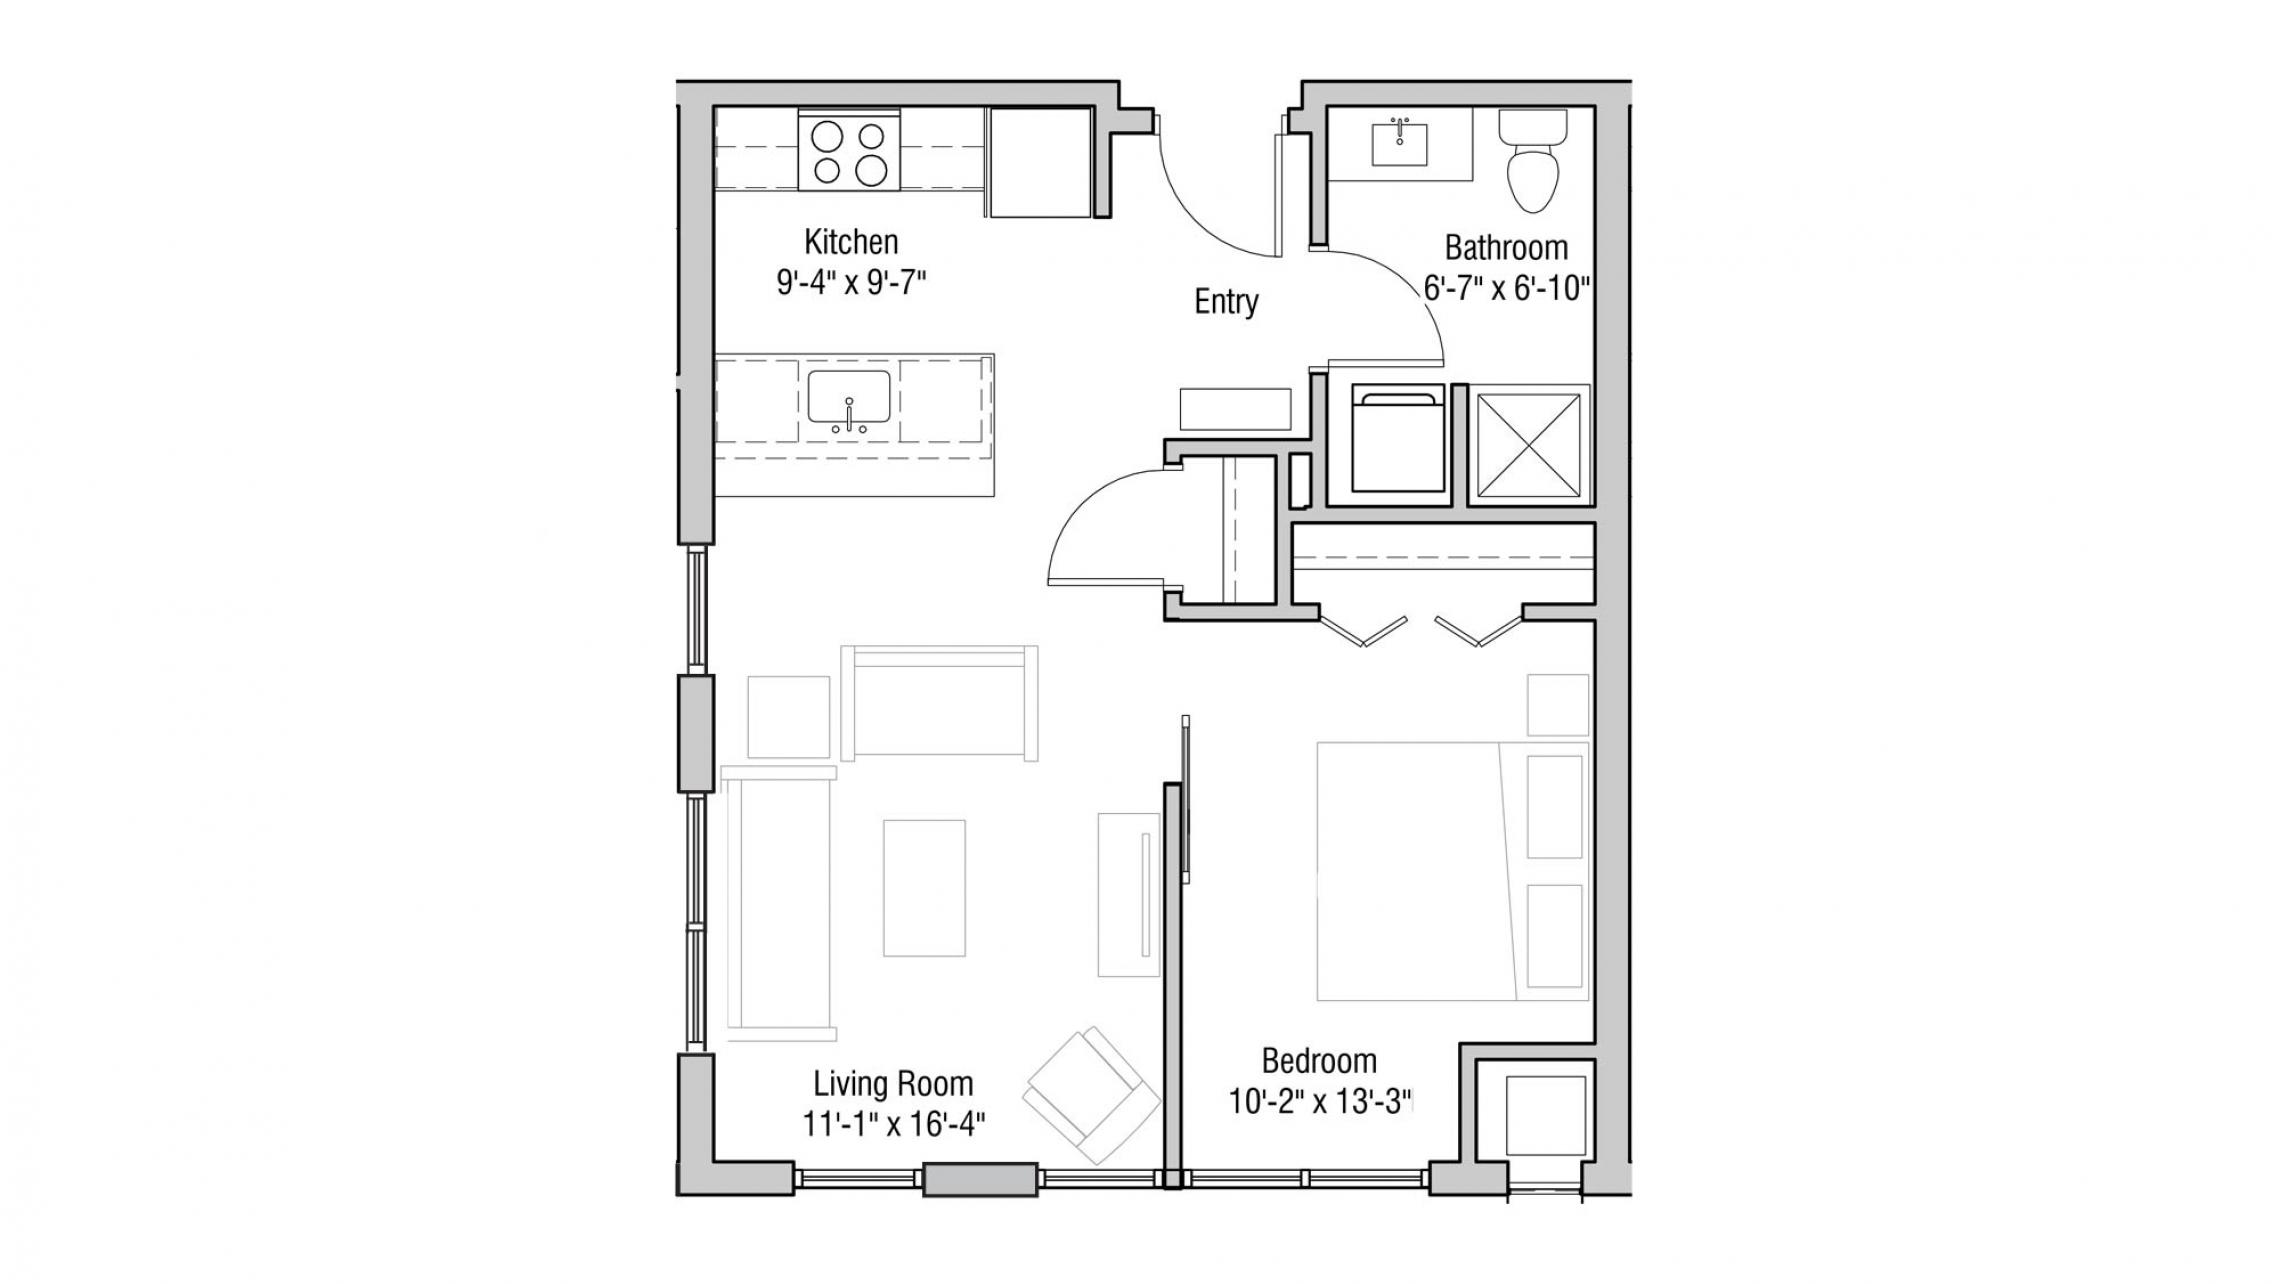 ULI Quarter Row Apartments - Unit 326 - One Bedroom, One Bathroom